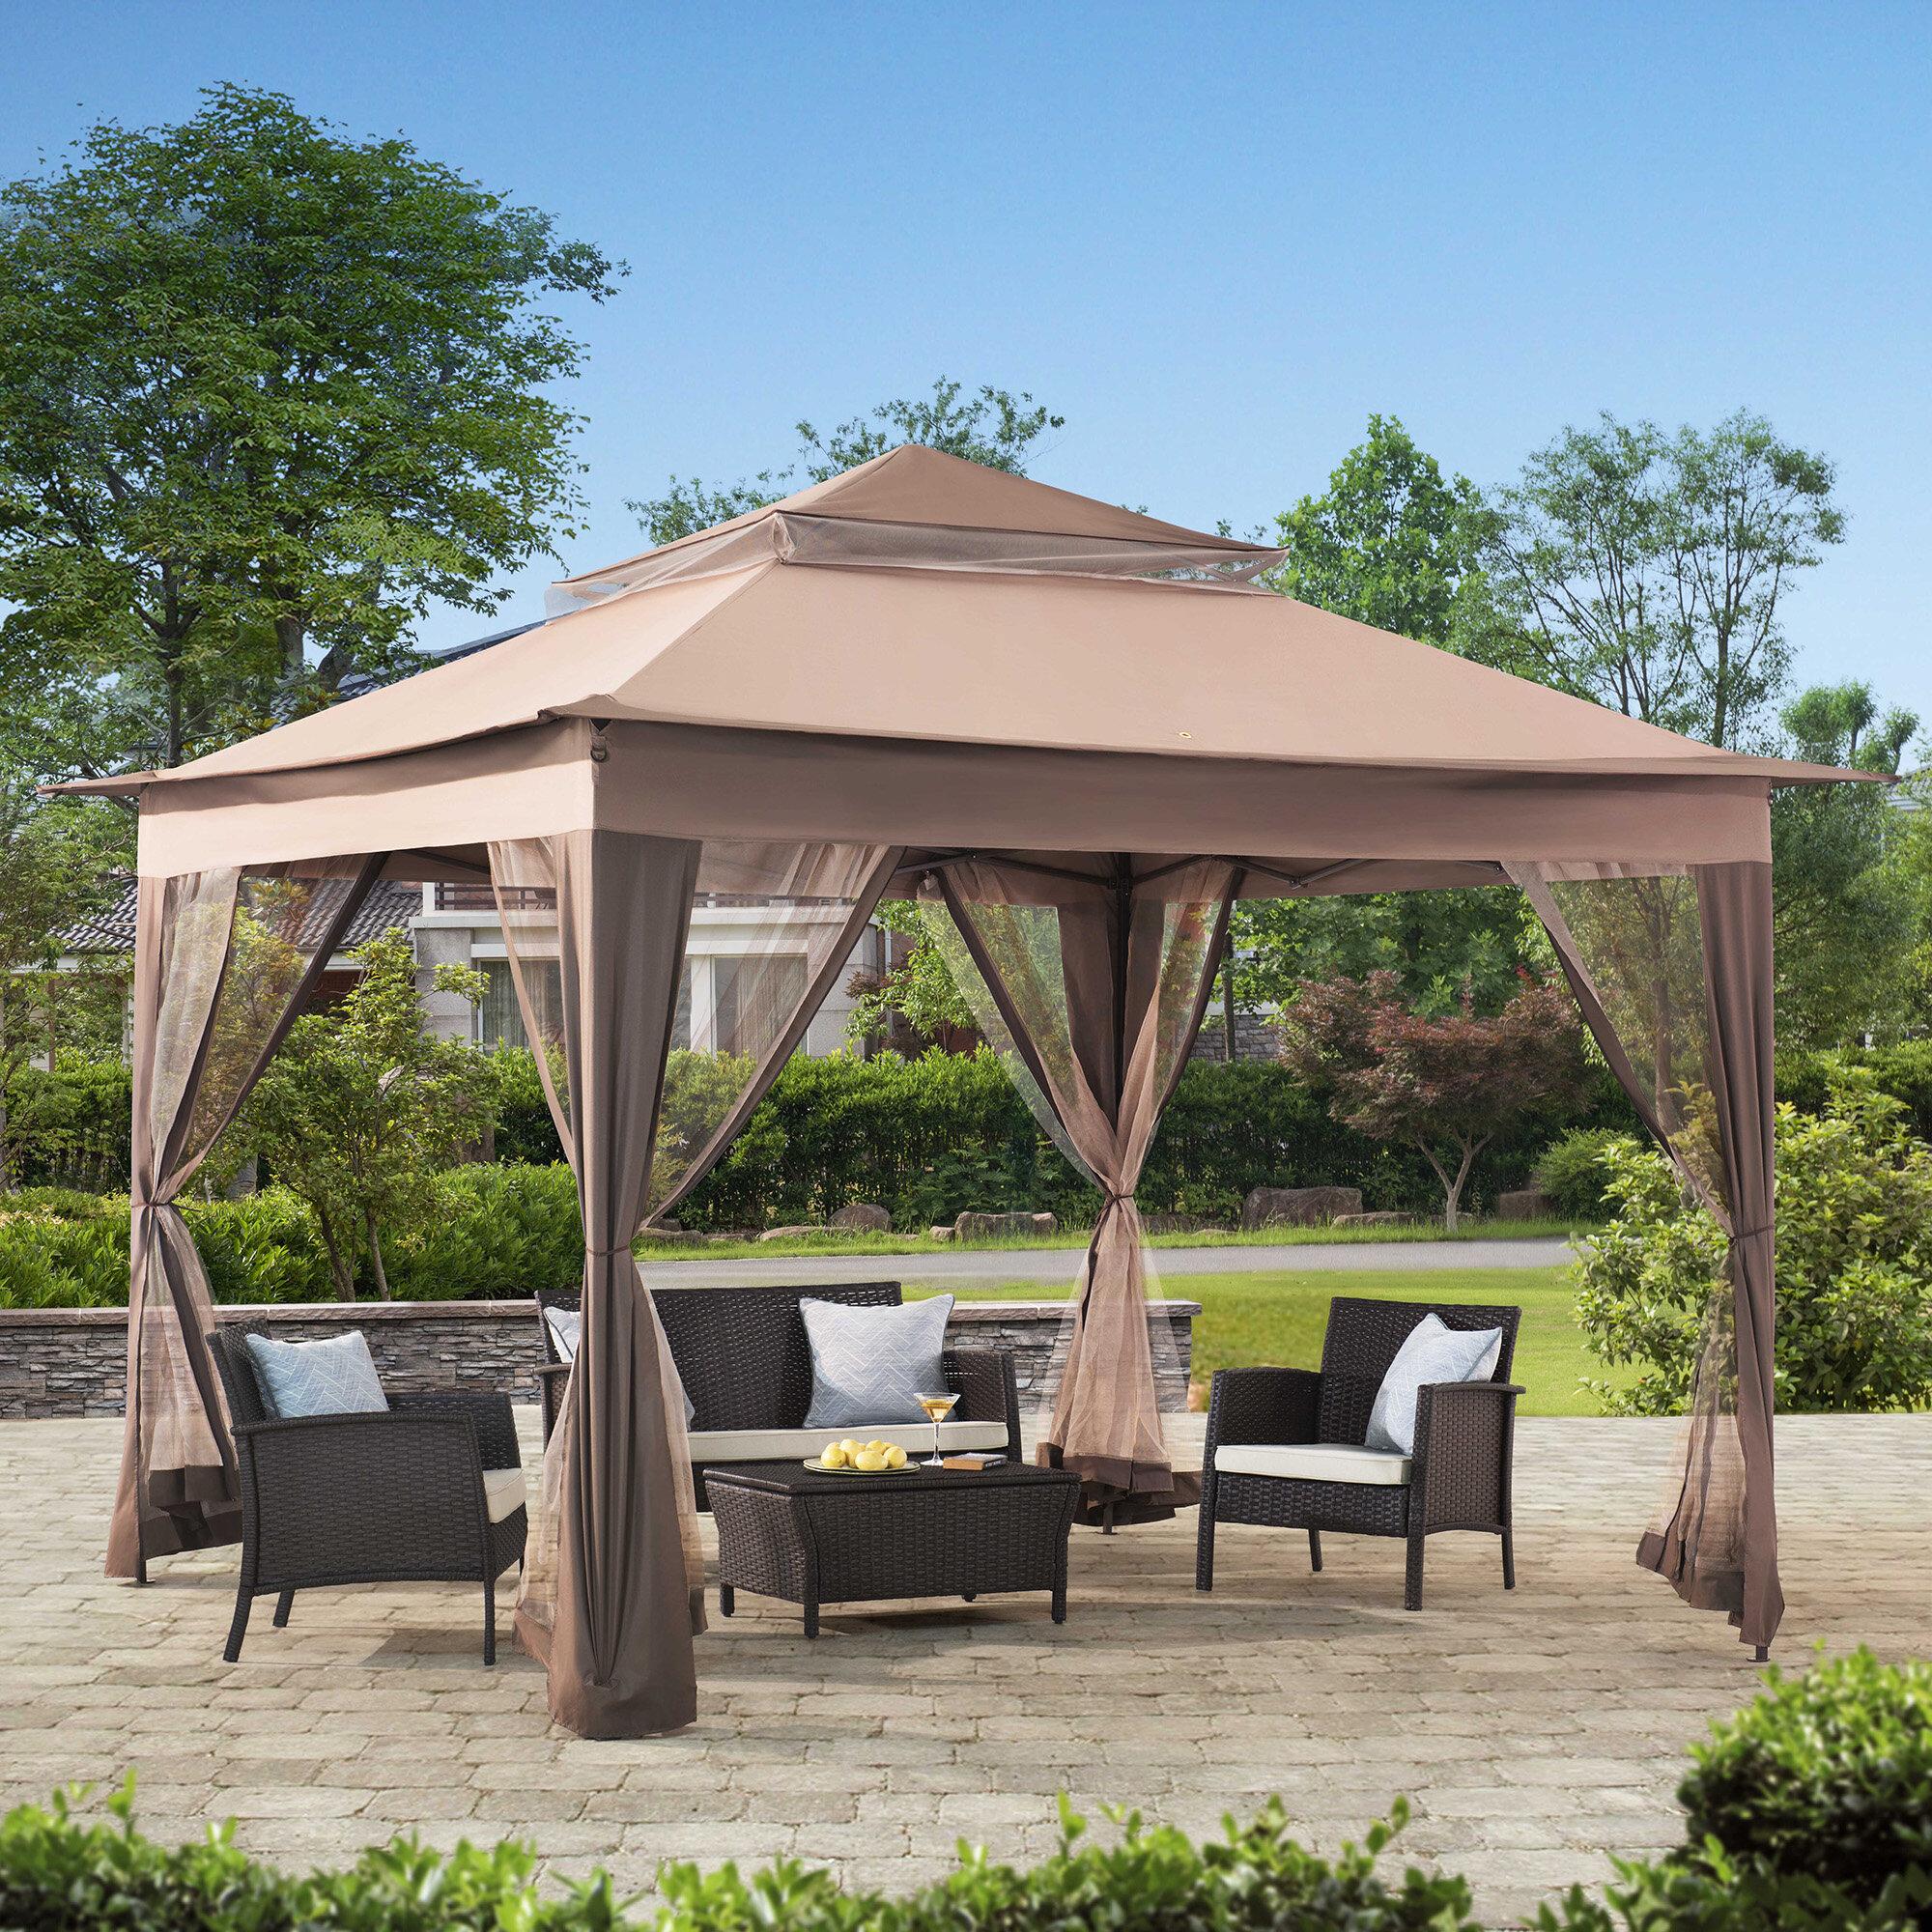 sunjoy 10 ft w x 10 ft d patio canopy reviews wayfair